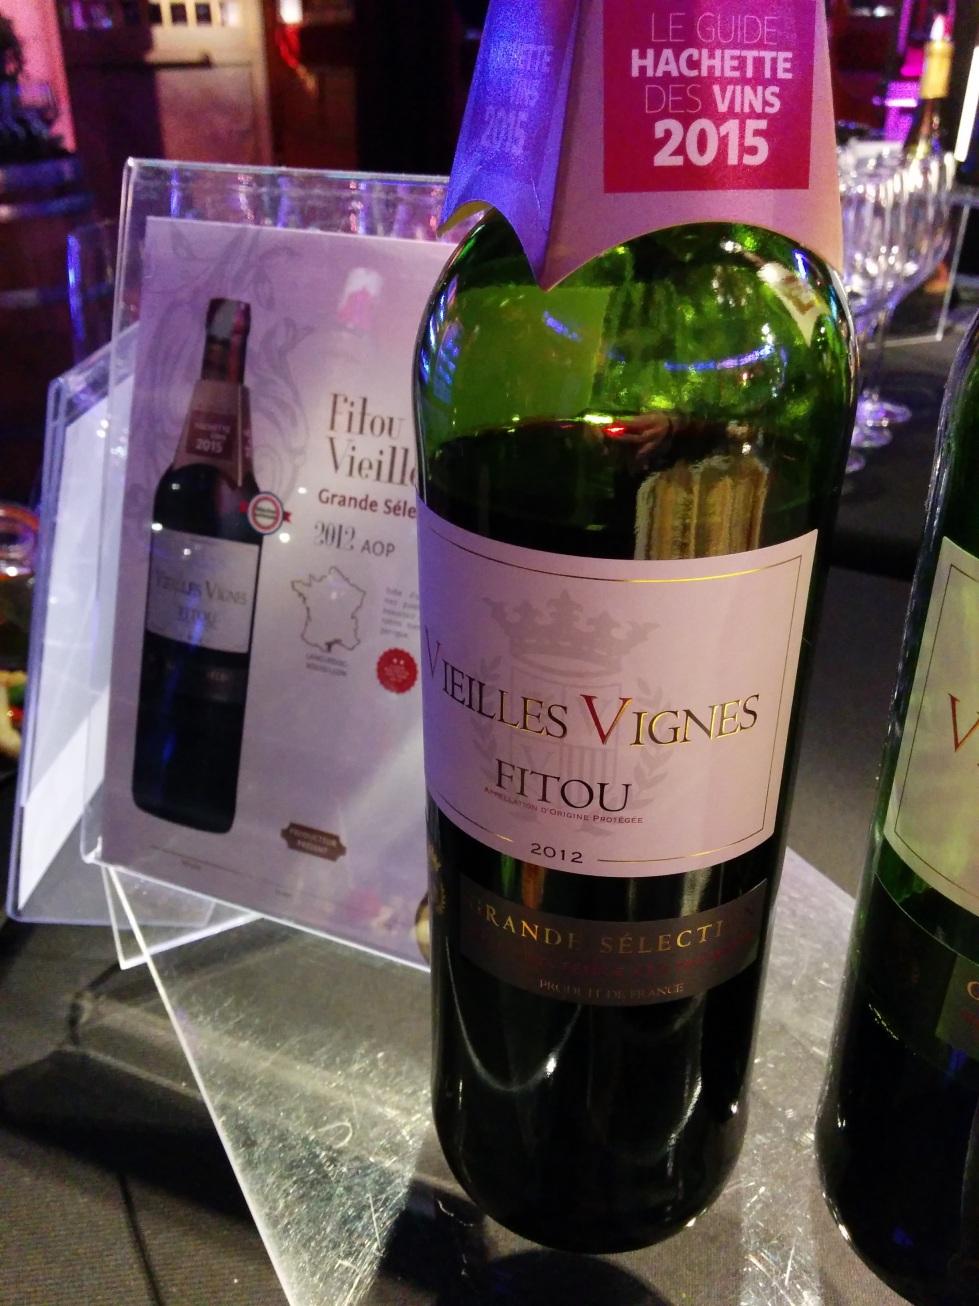 Vieilles Vignes Fitou 2012